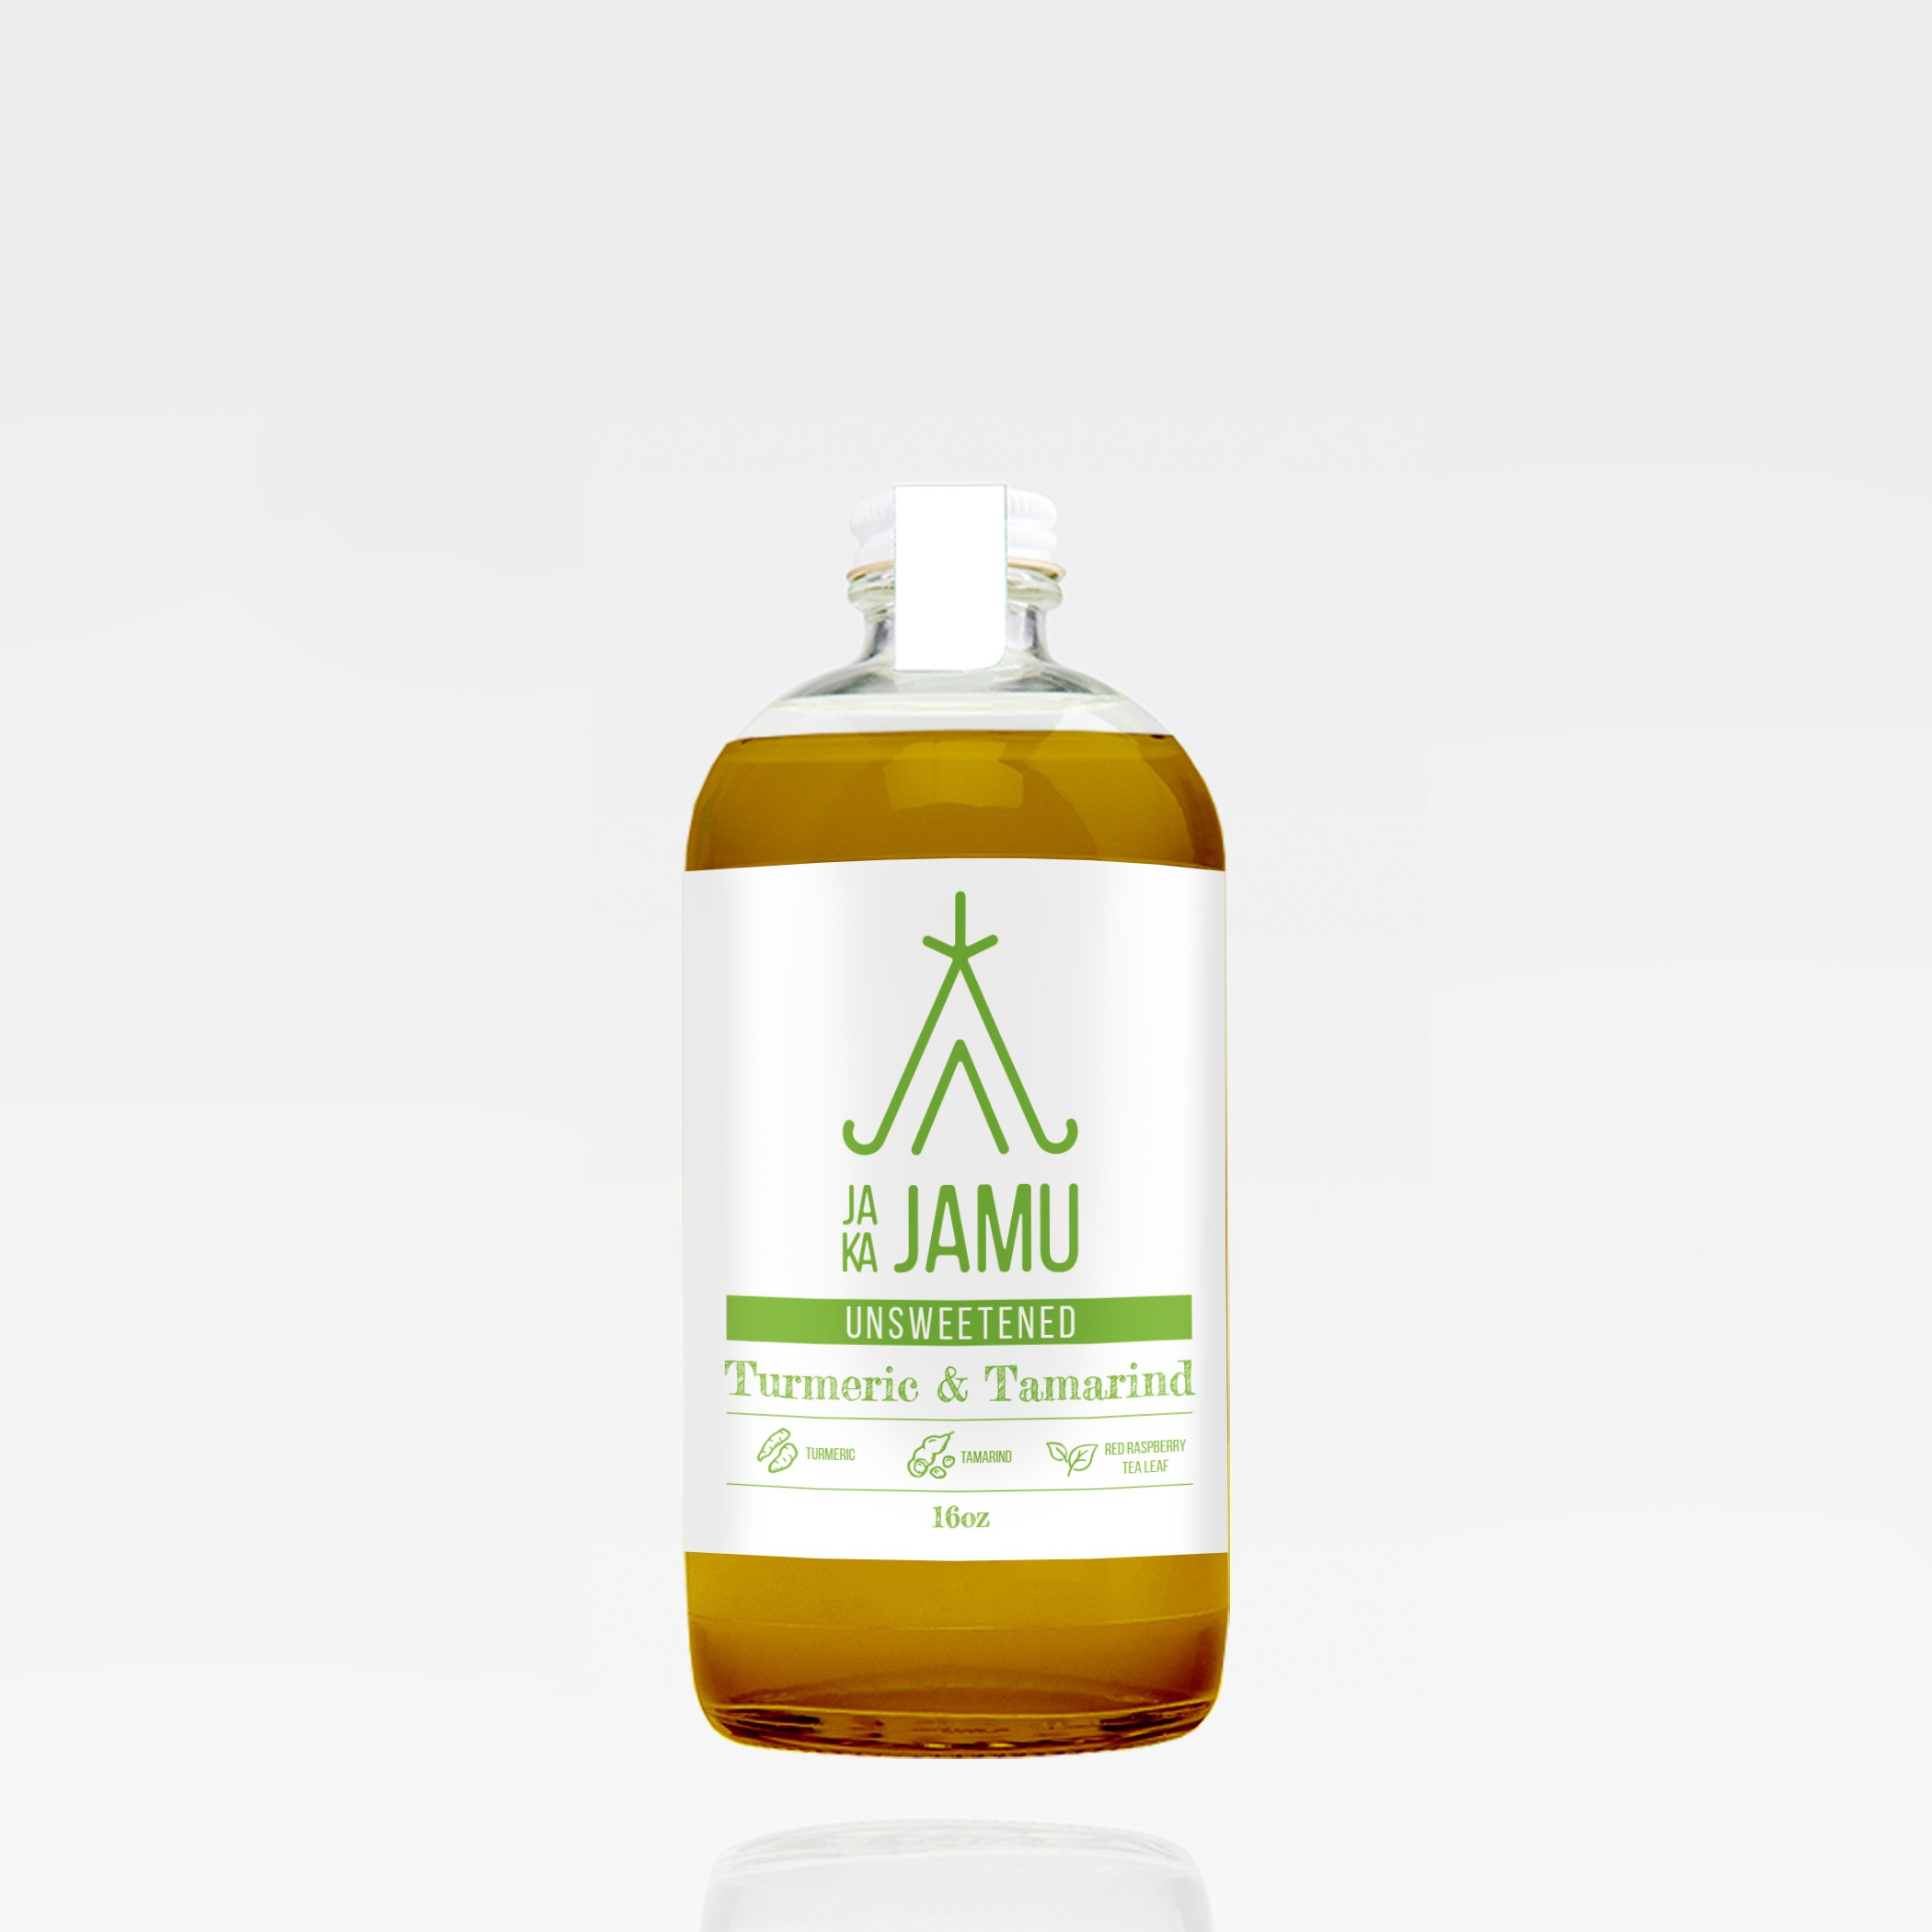 Logo & Label - Turmeric based & Indonesian inspired beverage